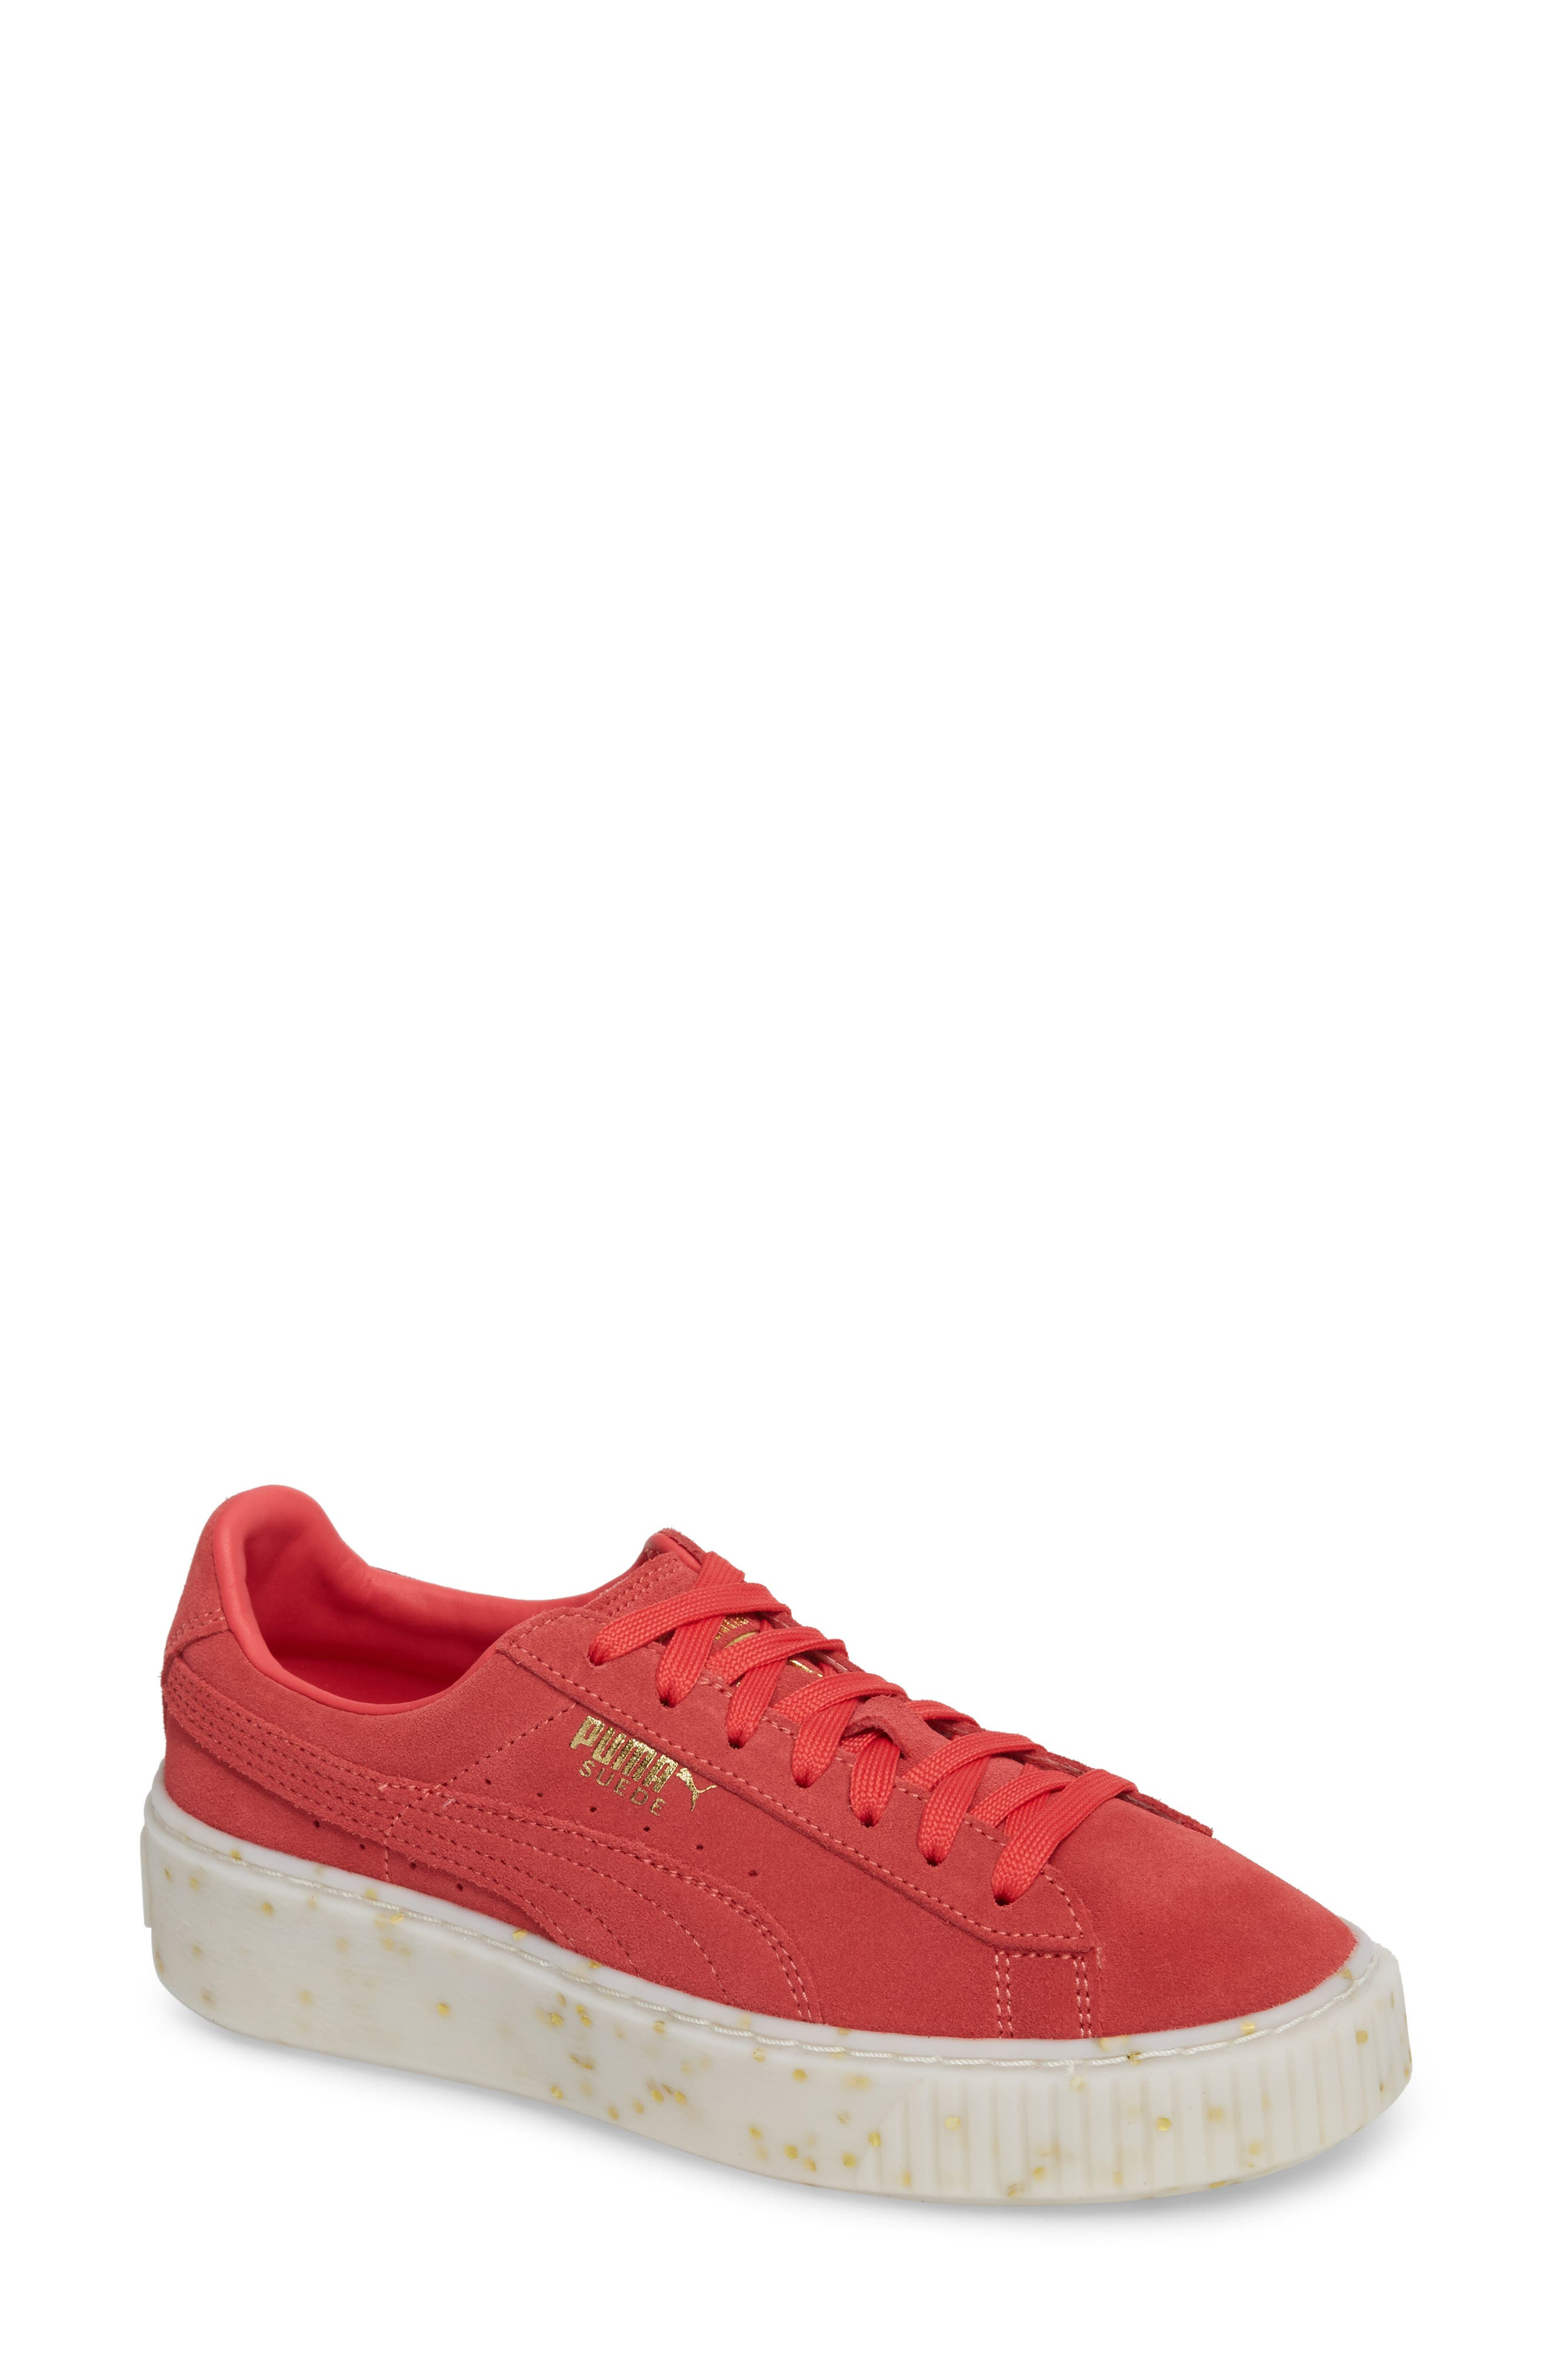 Main Image - PUMA Suede Platform Sneaker (Women)